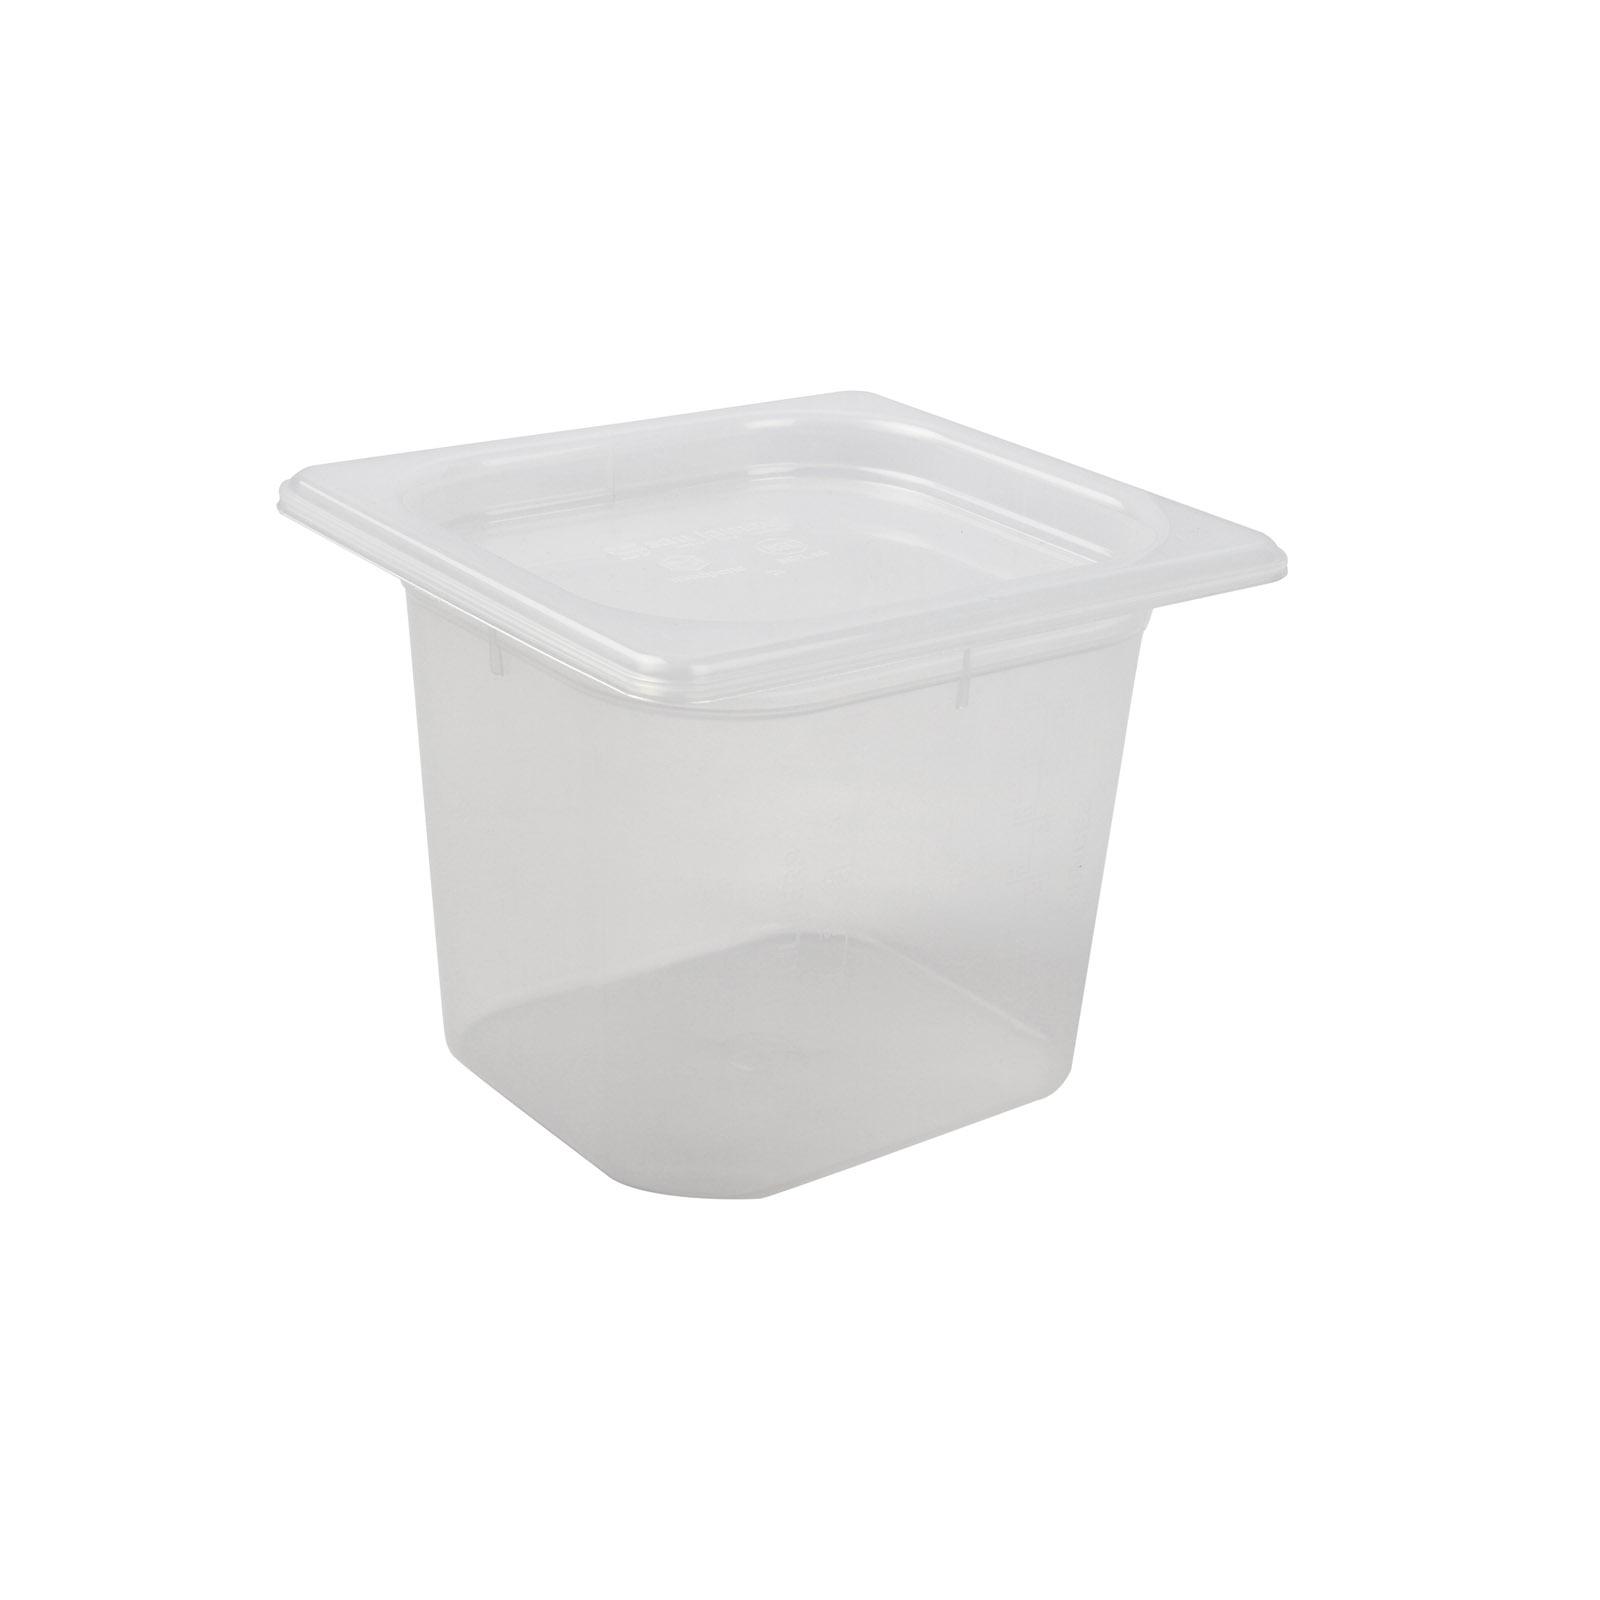 San Jamar MP16 food pan, plastic